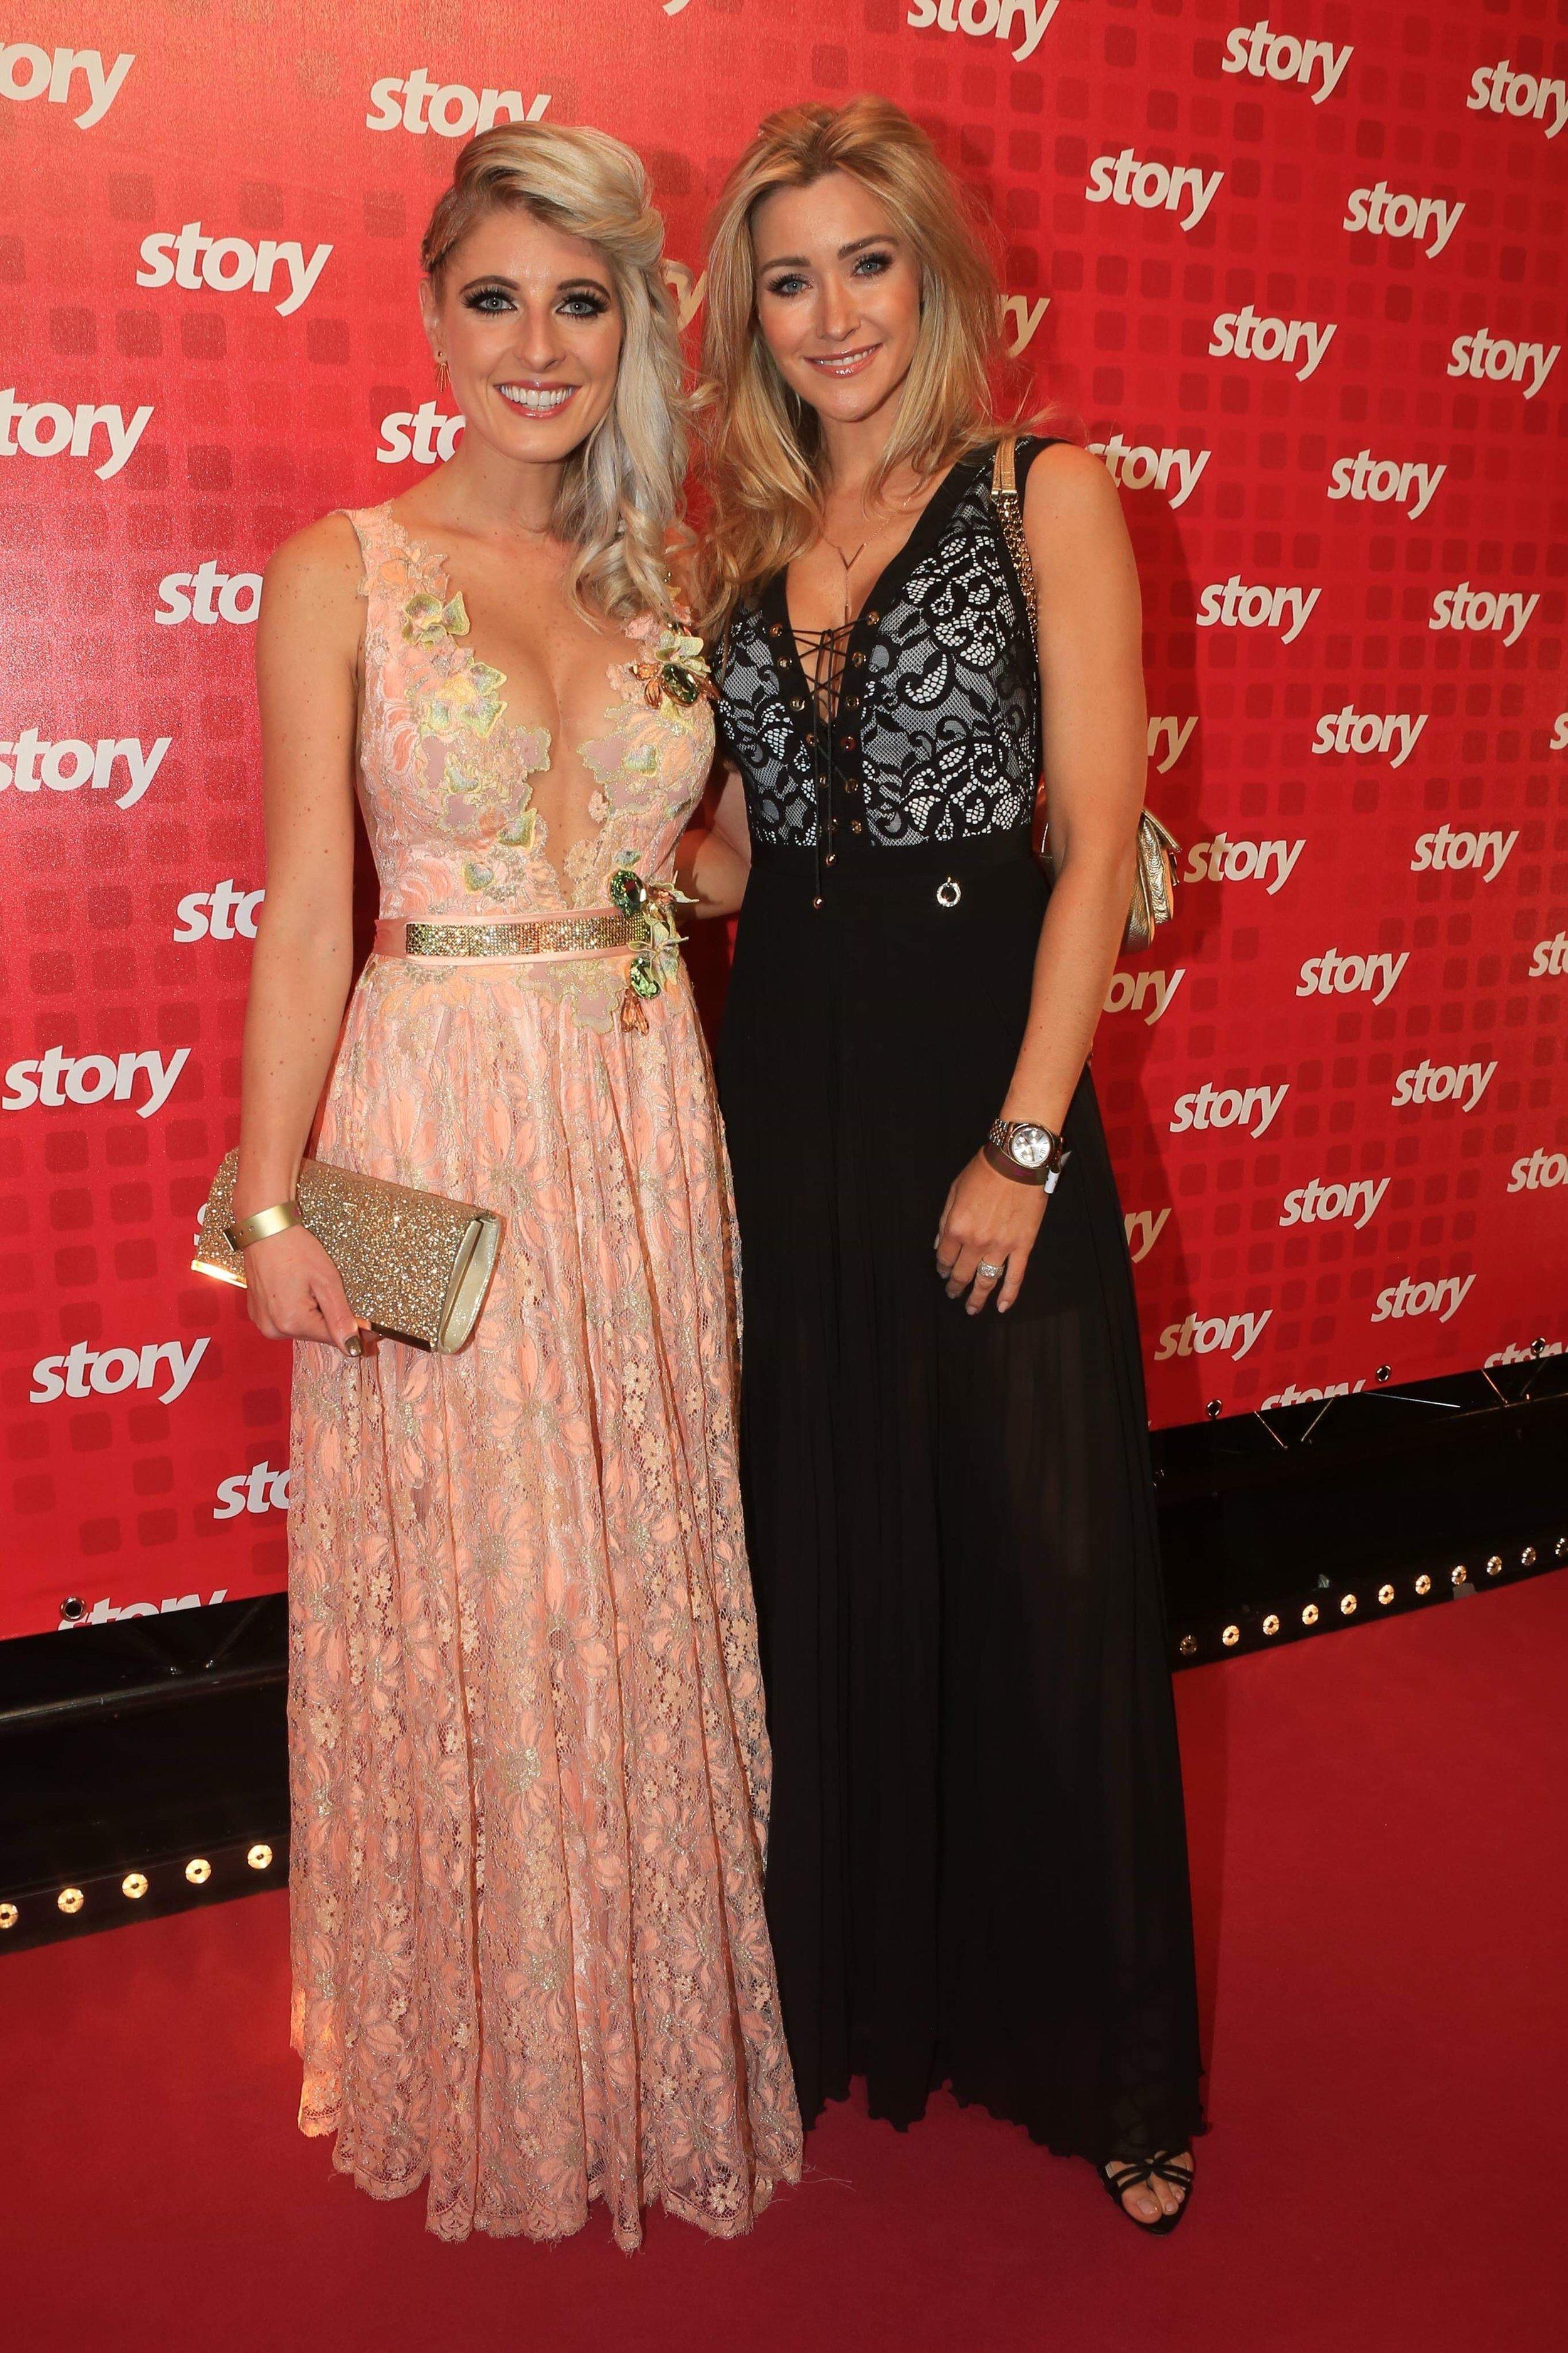 Story Showbizz Awards